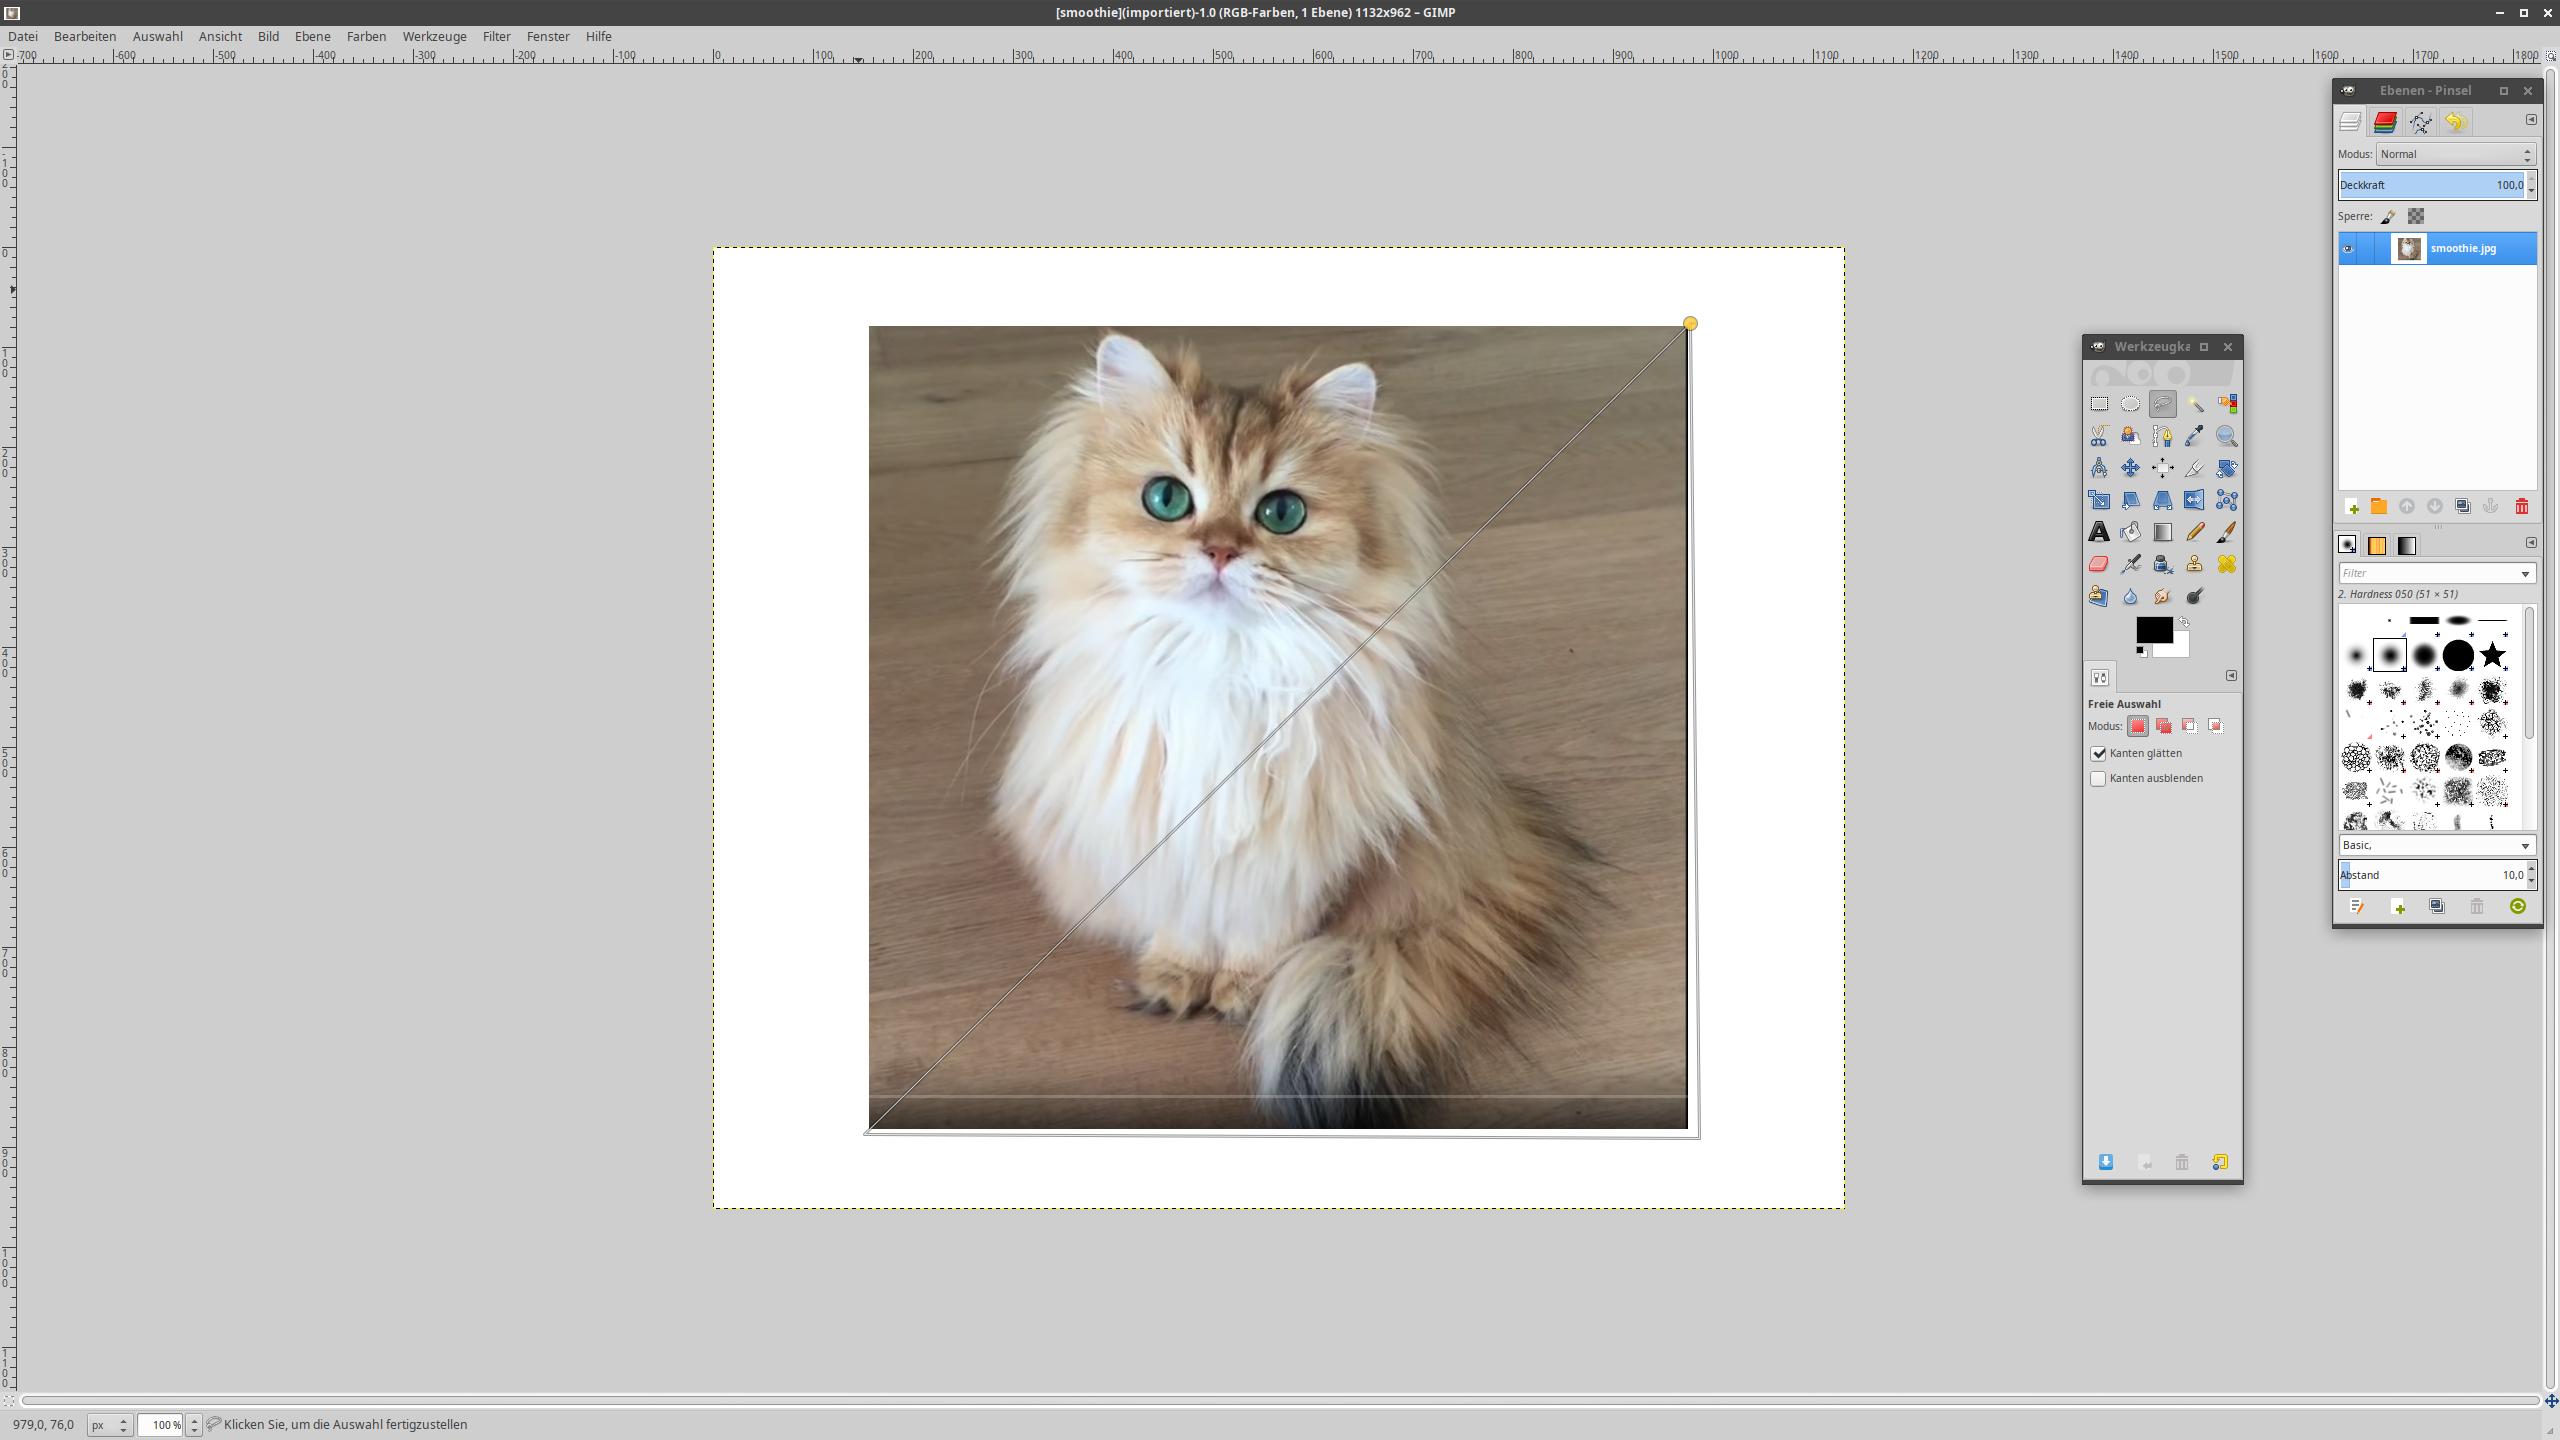 [smoothie](importiert)-1.0 (RGB-Farben, 1 Ebene) 1132x962 – GIMP_011.png